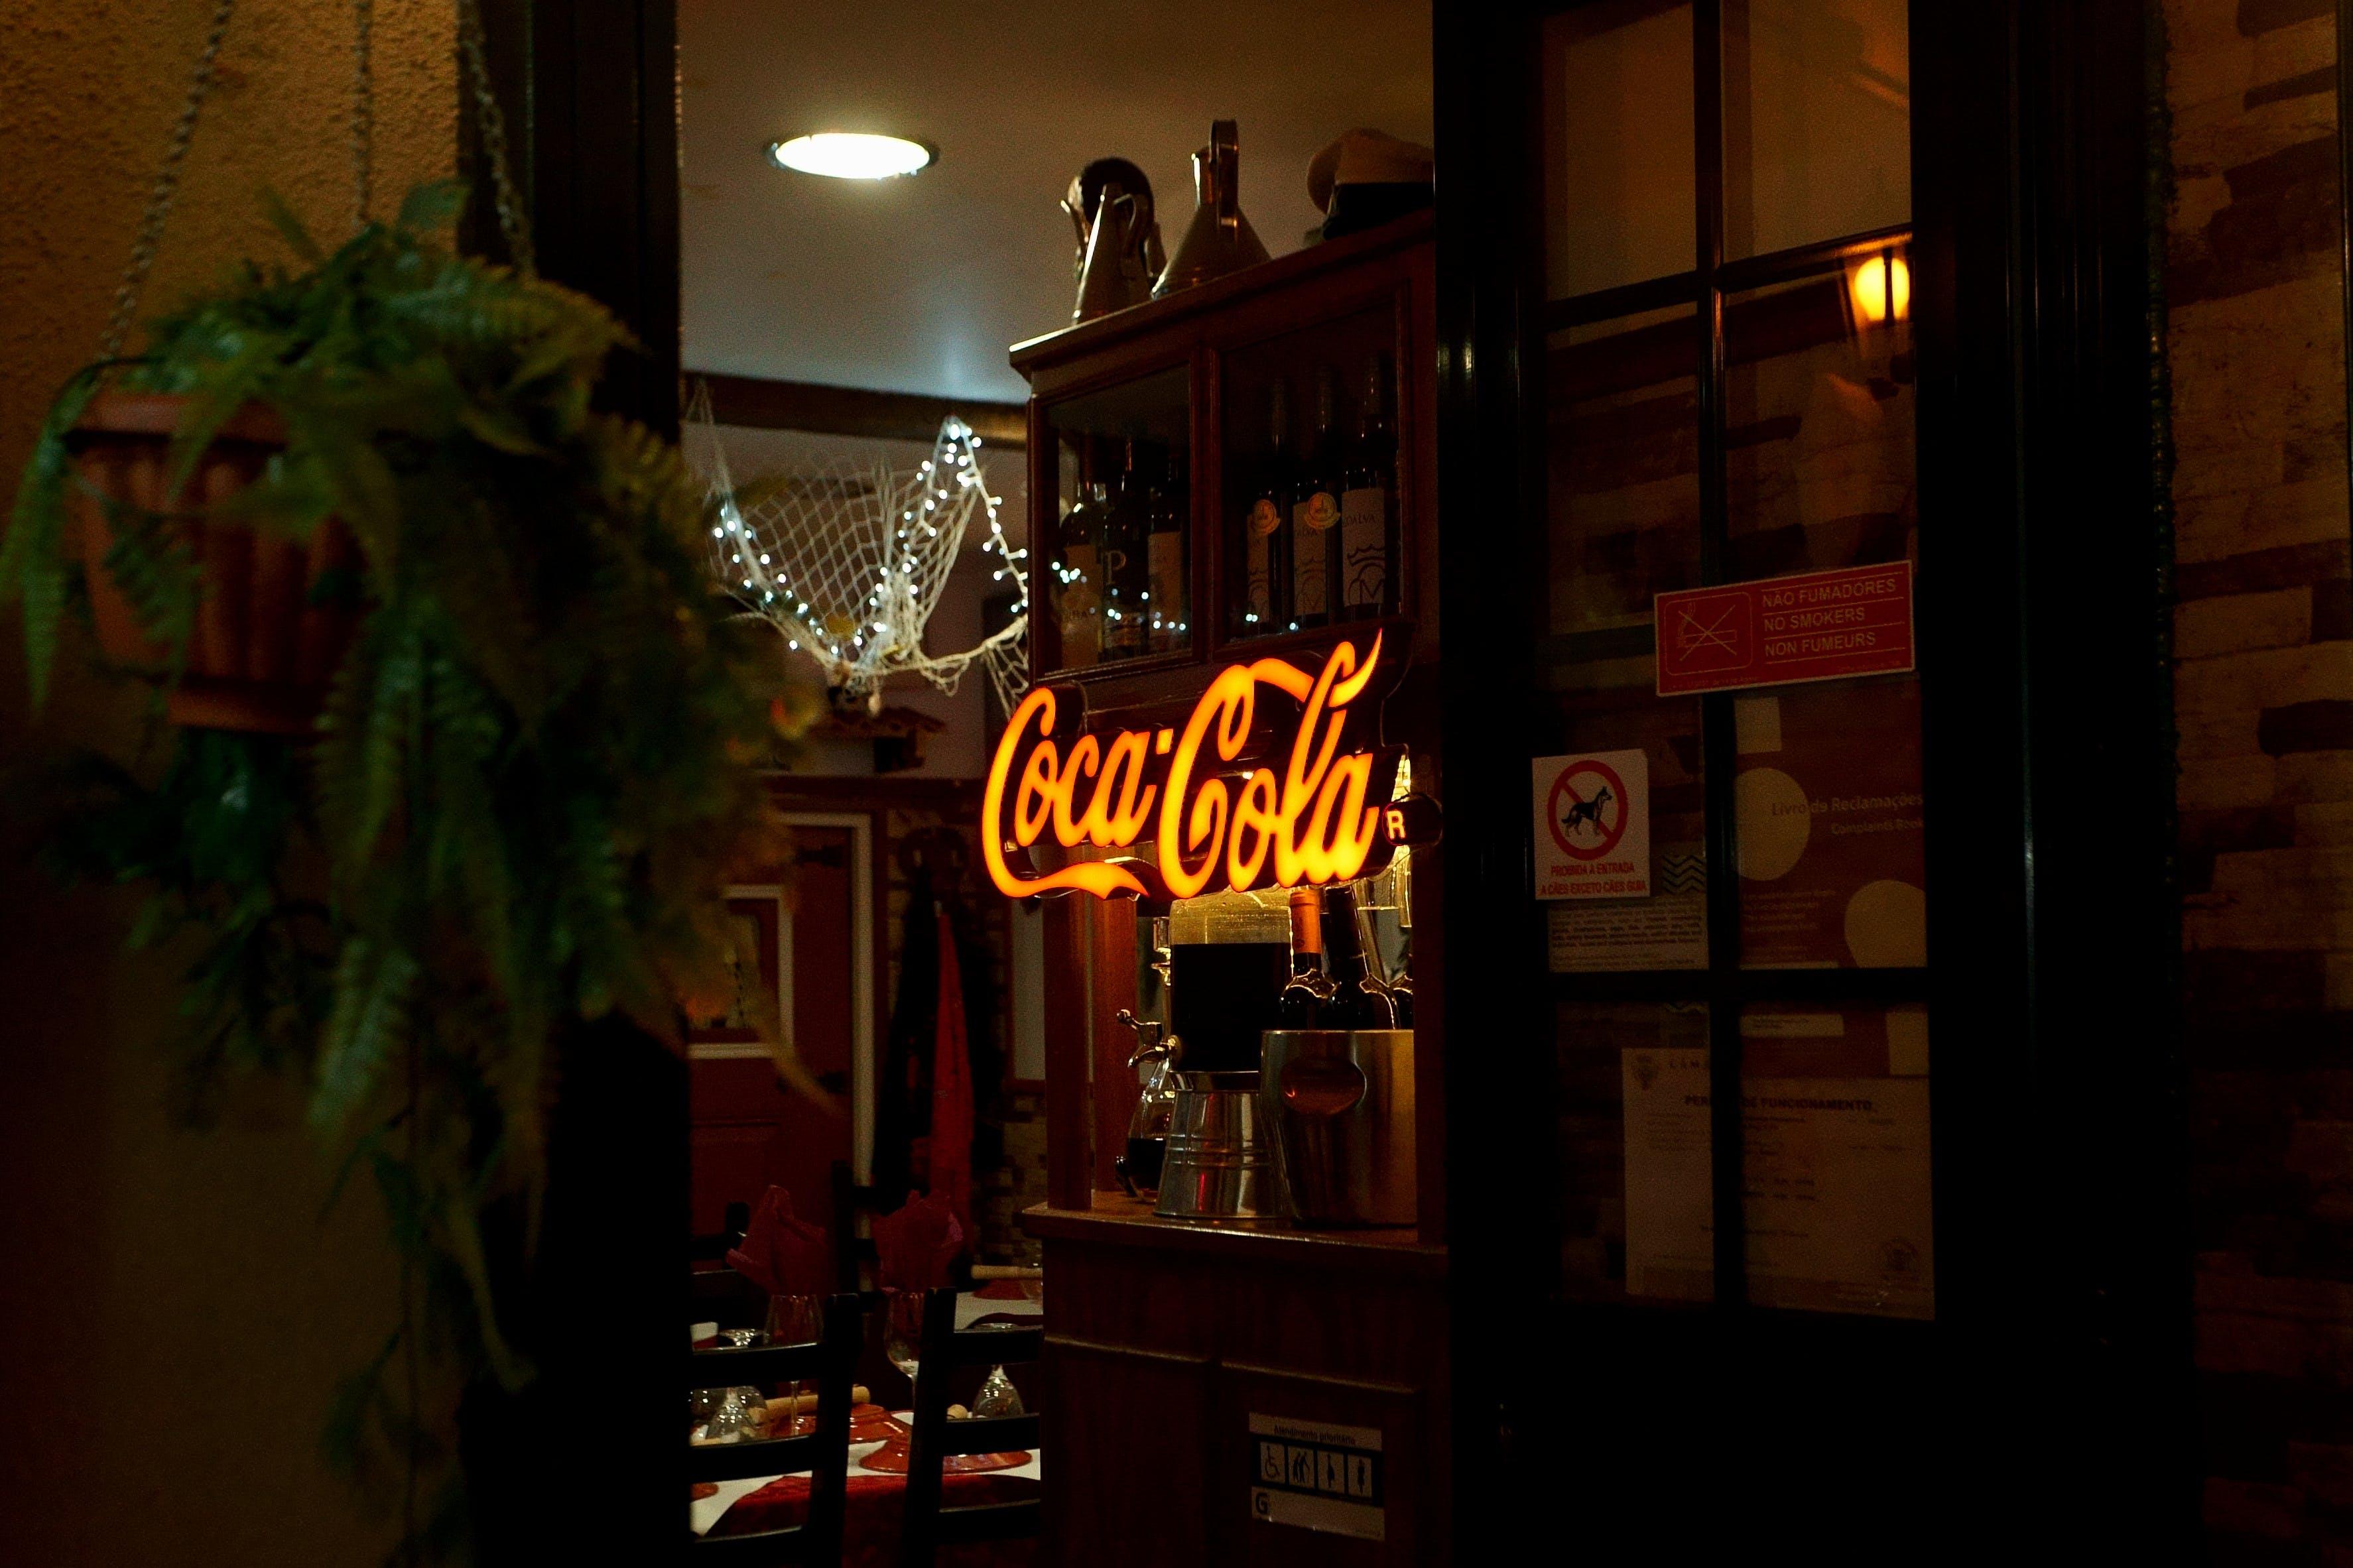 Lighted Coca-cola Signage